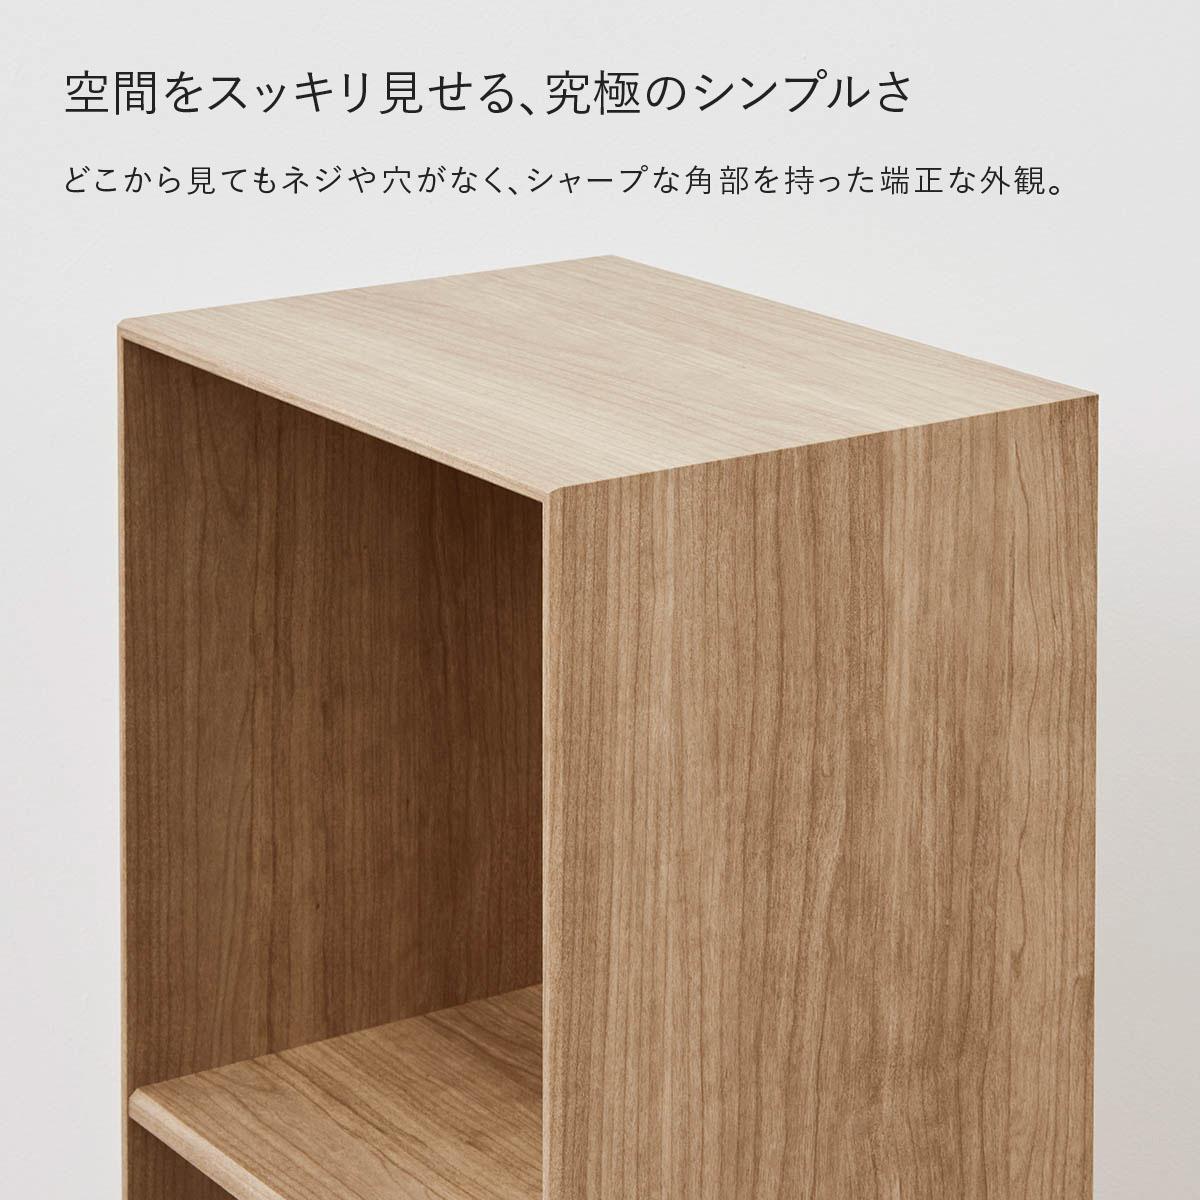 【V-TISS LIGHT  Set Plan-D】 ボックスユニットと天板による、壁面の飾り棚を組み合わせたテレビボード